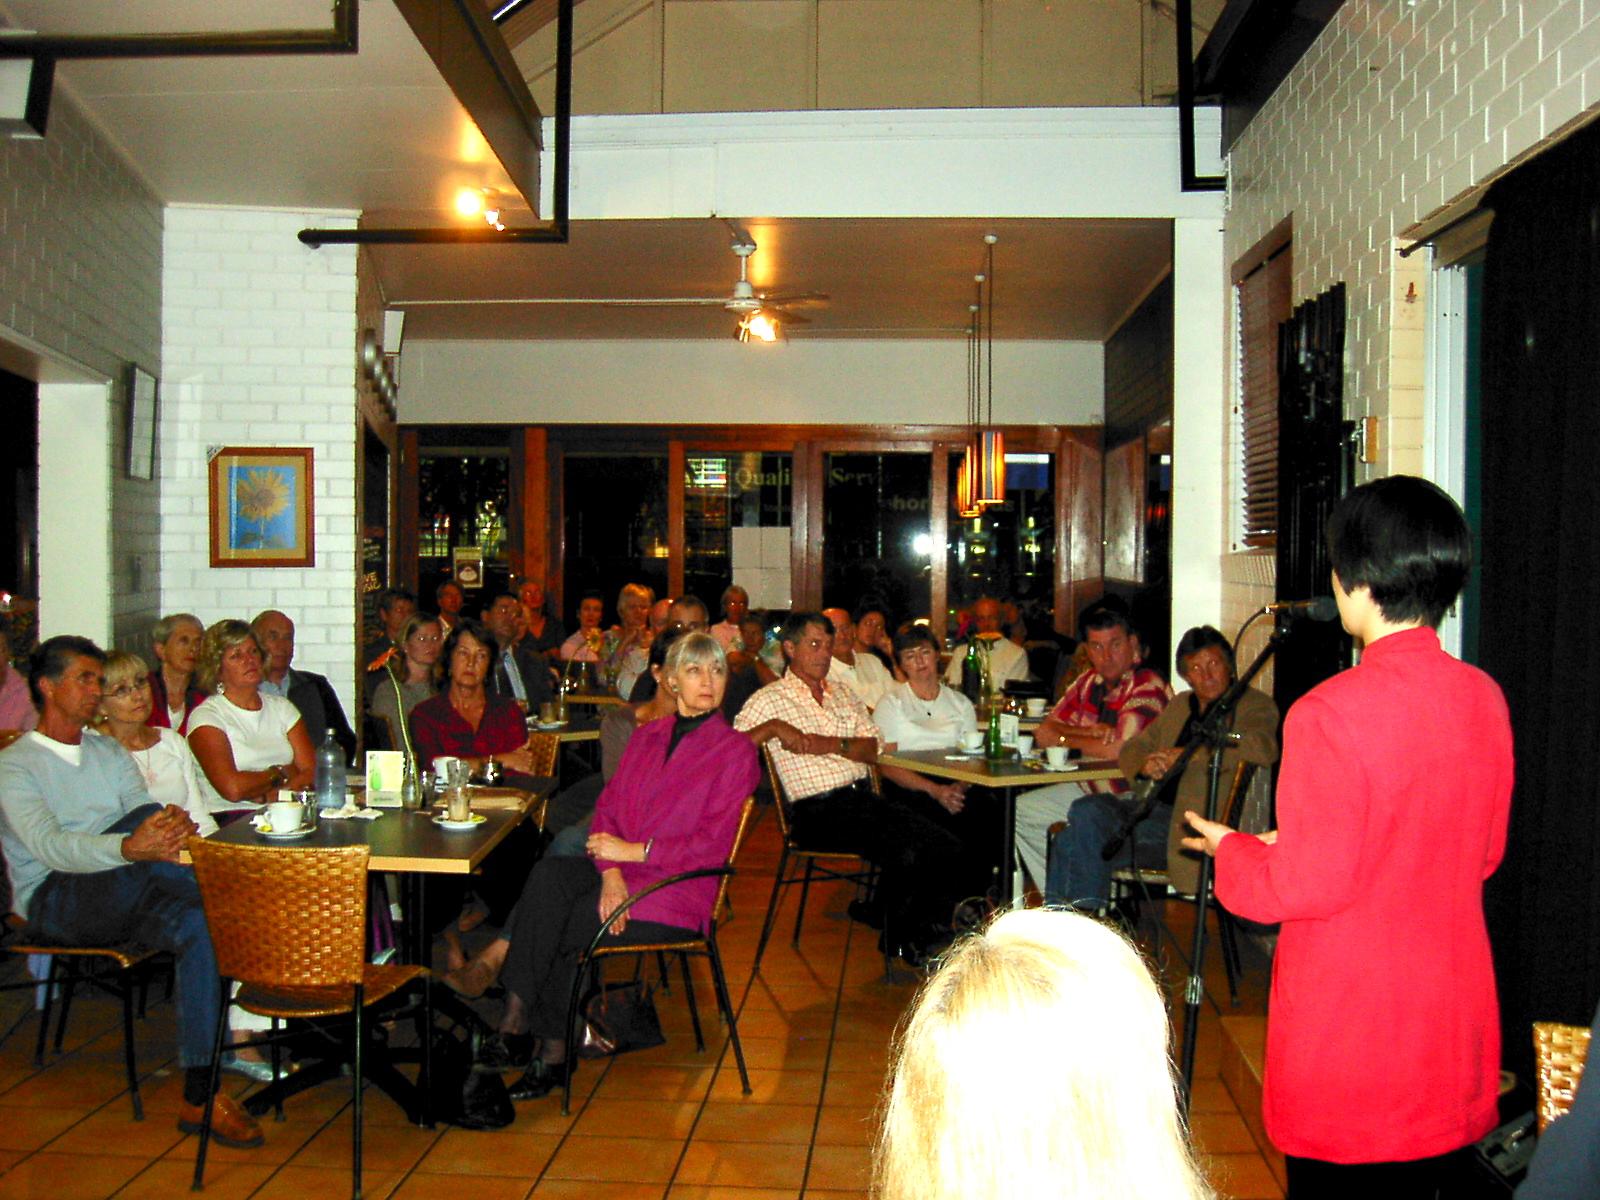 Jennifer at a book signing event at Buderim, Sunshine Coast, Australia on May 5, 2005